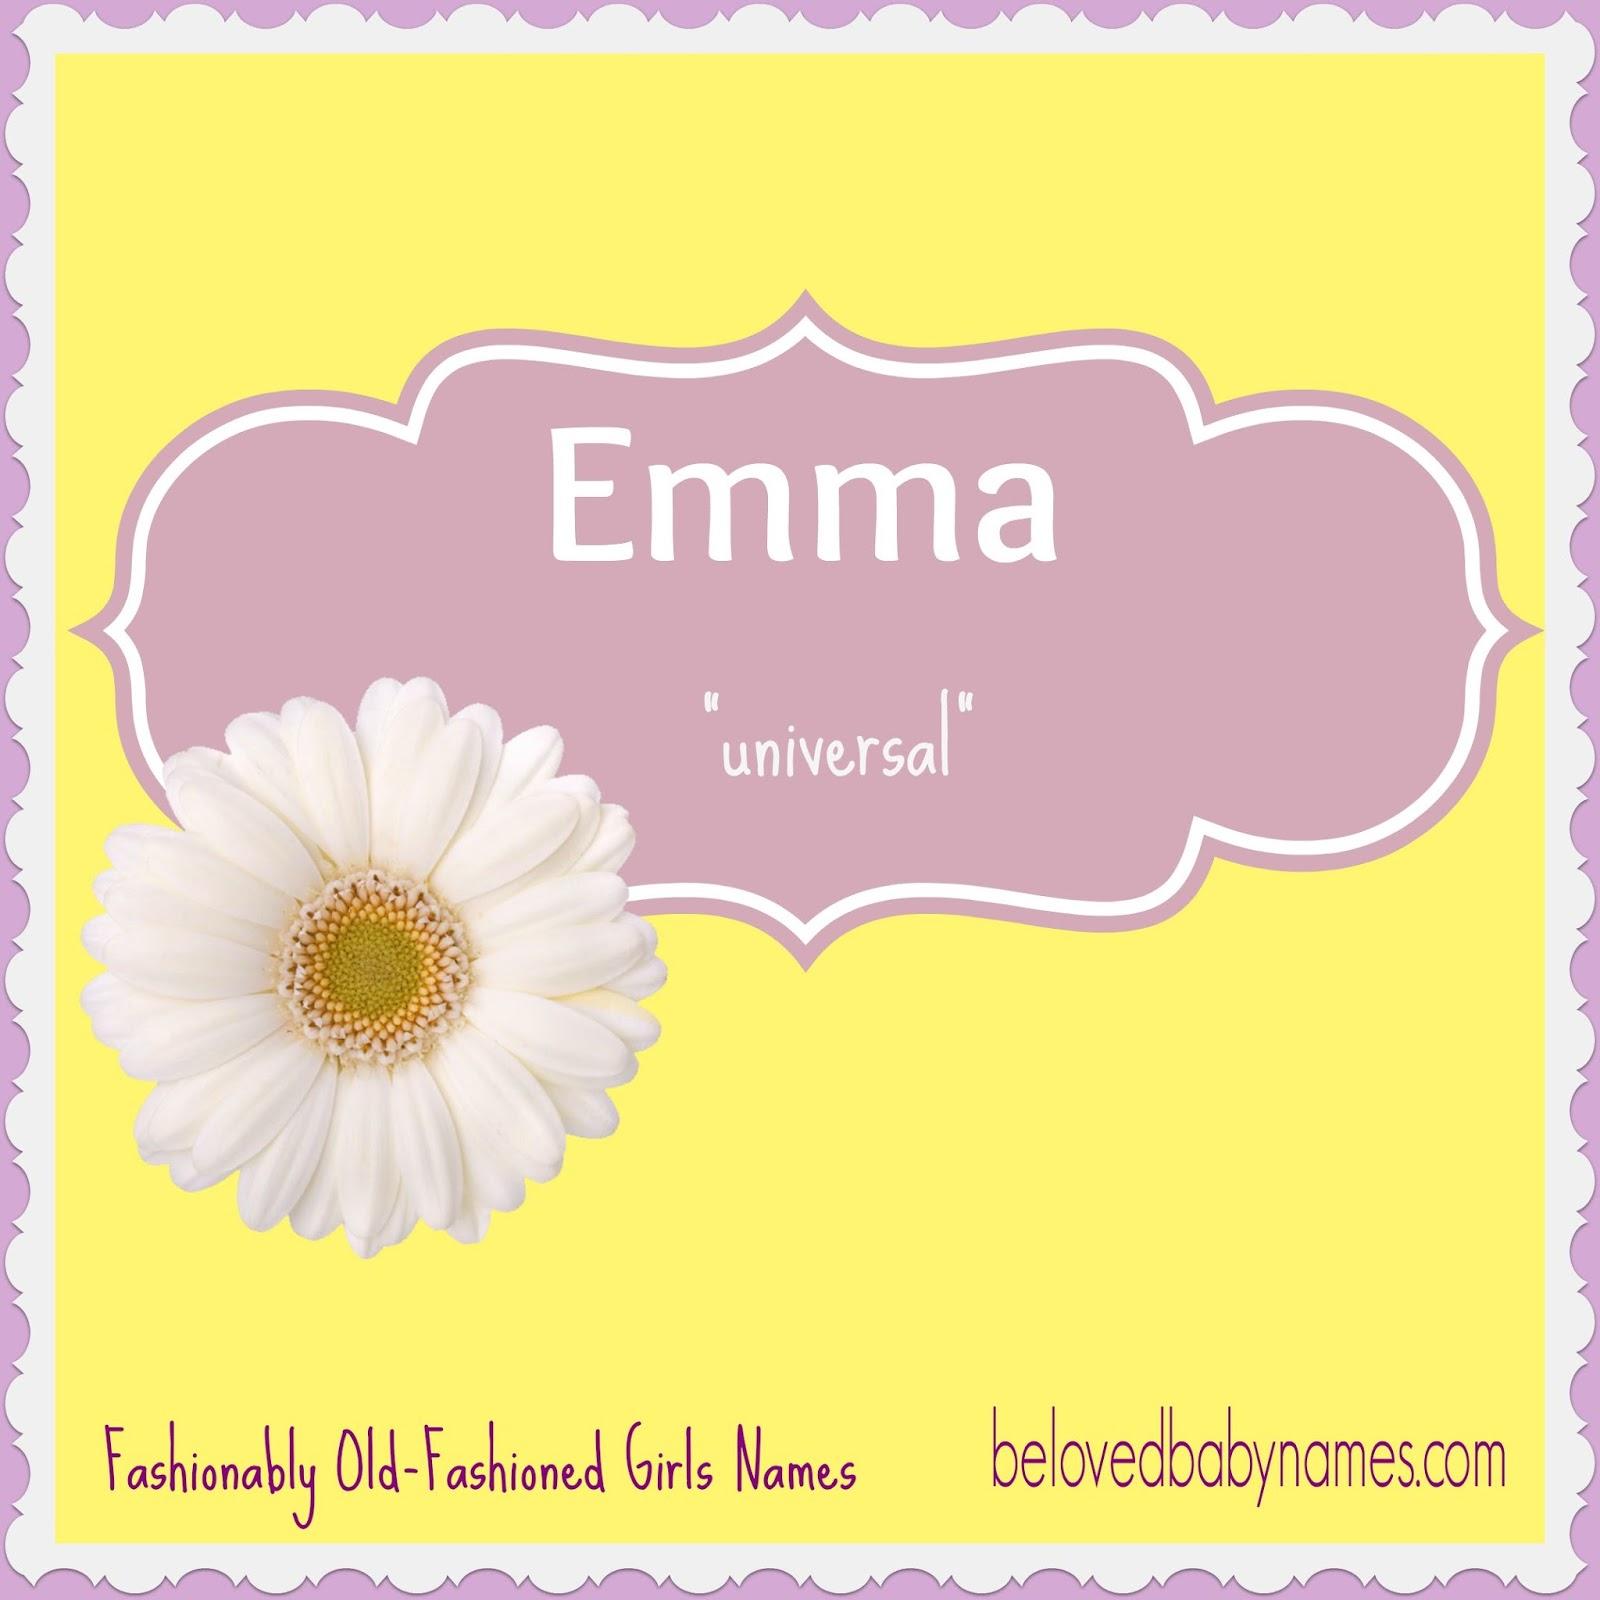 Beloved Baby Names July 2015